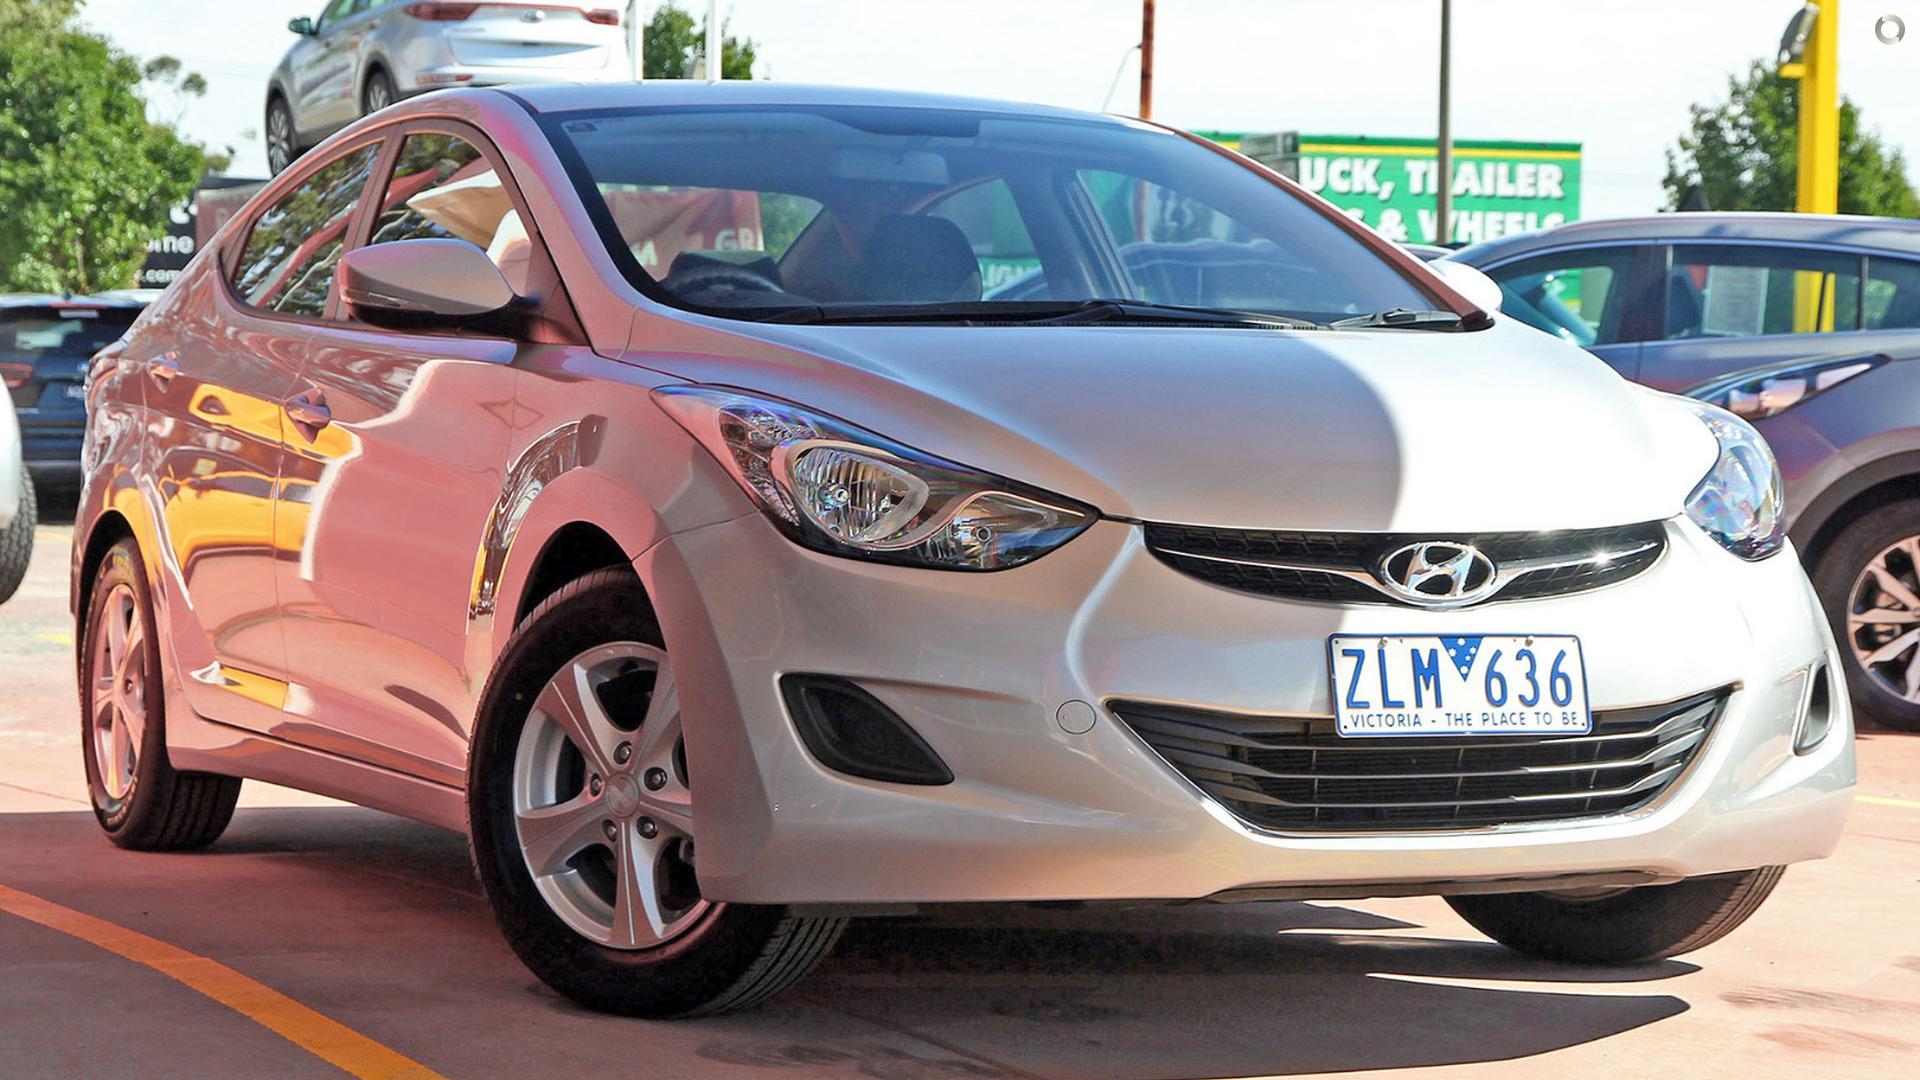 2012 Hyundai Elantra Active MD